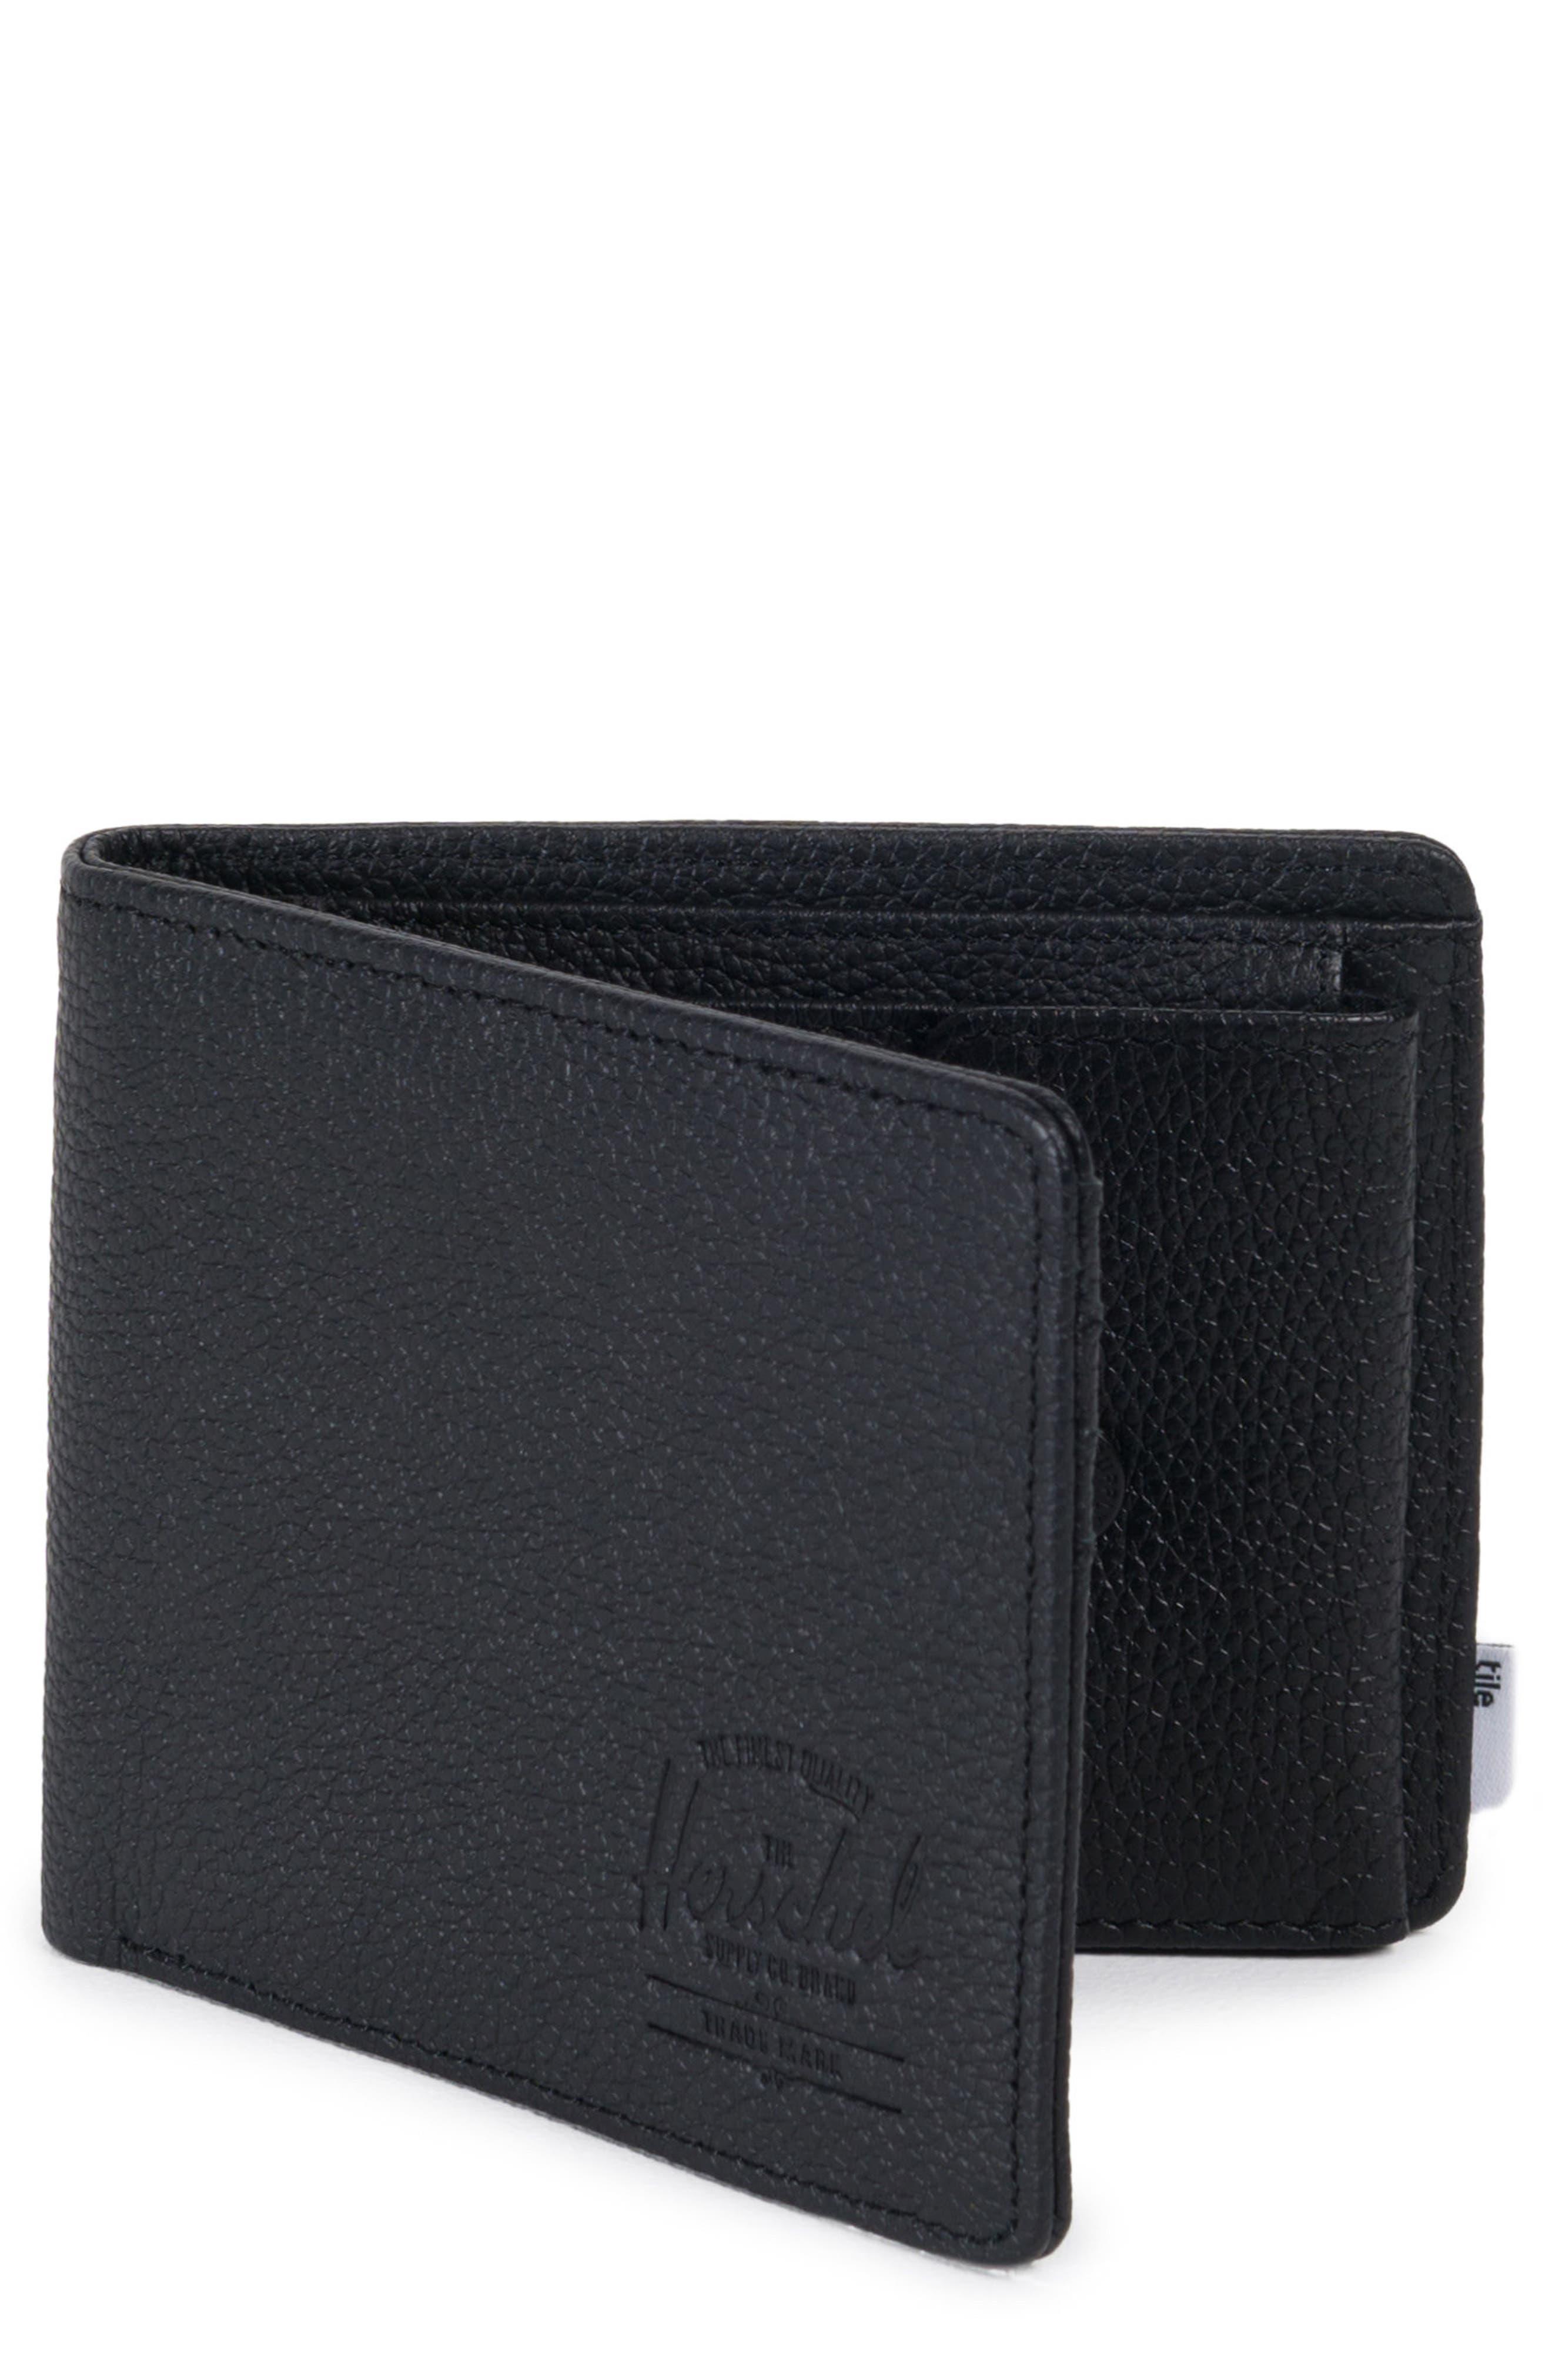 Tile Roy Leather Wallet,                             Main thumbnail 1, color,                             001